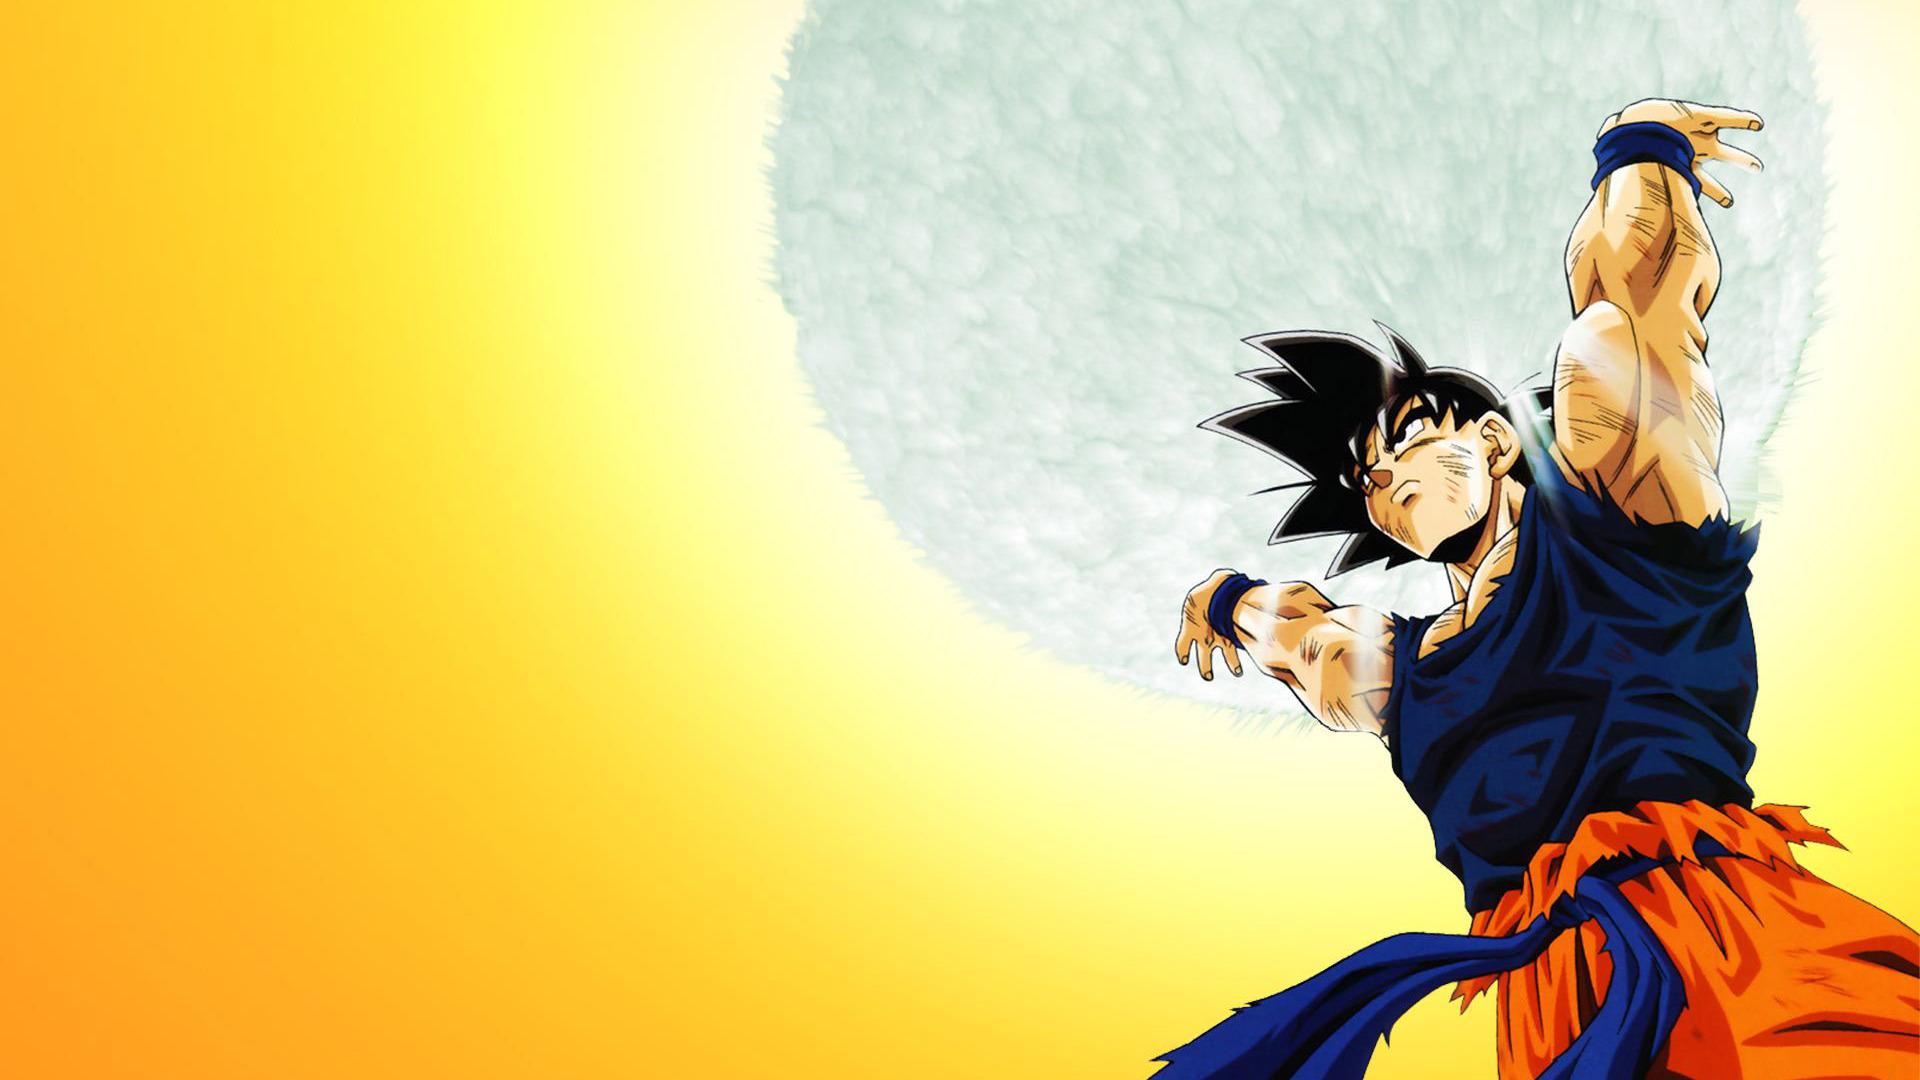 Dragon Ball Z   Goku Widescreen Wallpaper   6415 1920x1080